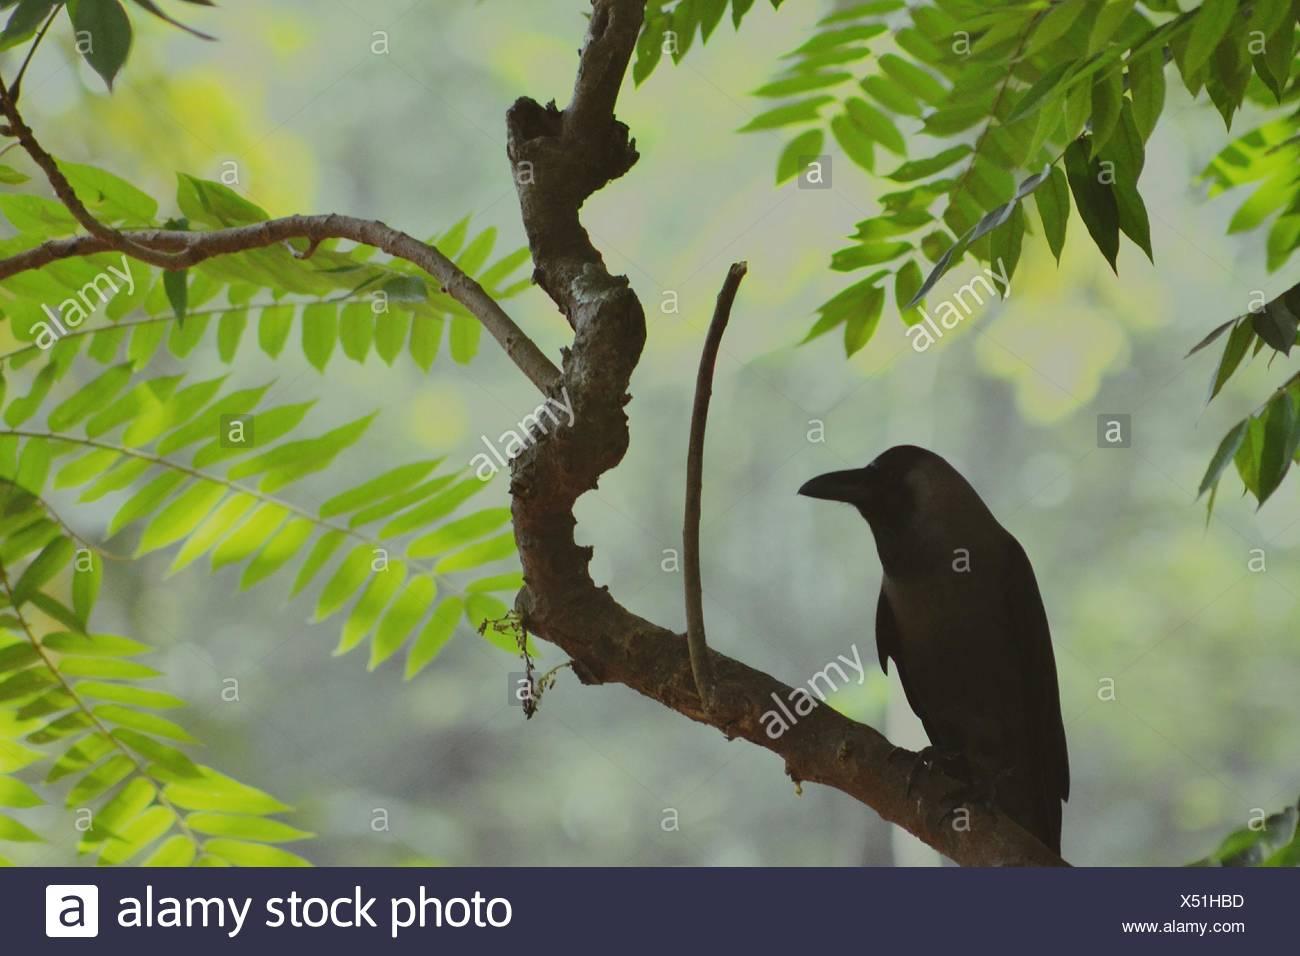 Black Raven Perching On Robinia Tree - Stock Image